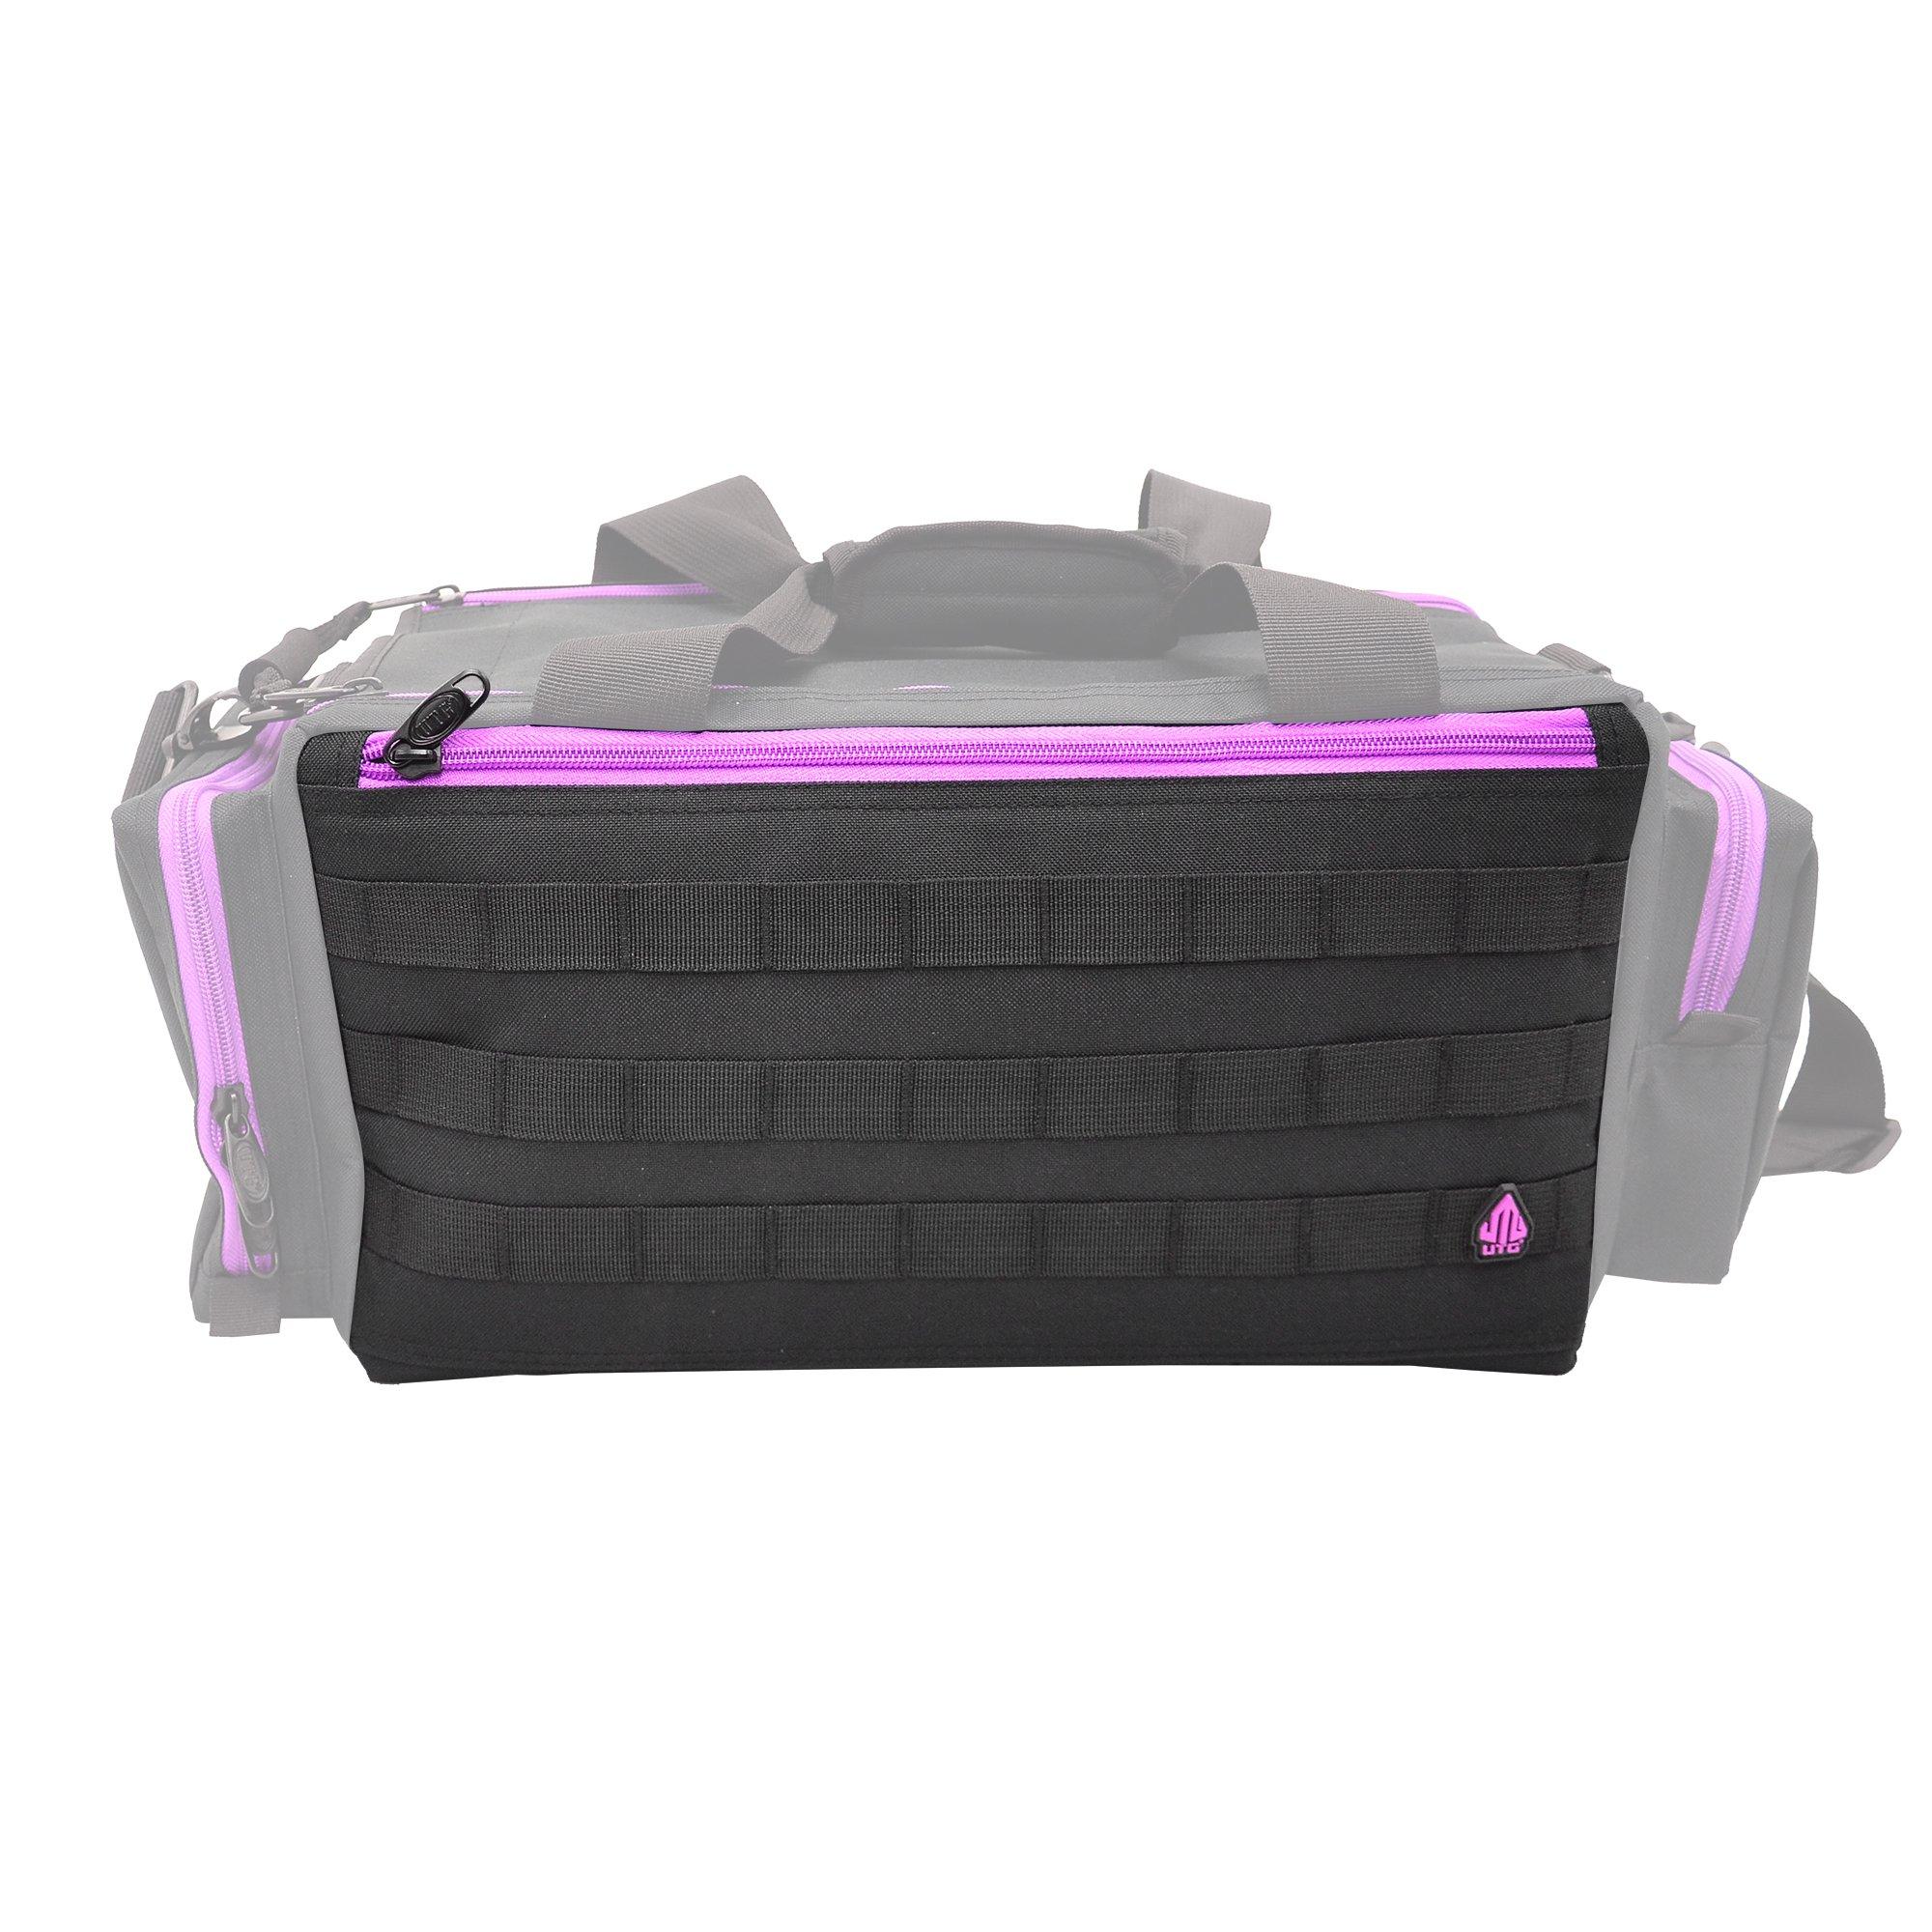 UTG All in One Range/Utility Go Bag, Black/Violet, 21'' x 10'' x 9'' by UTG (Image #10)